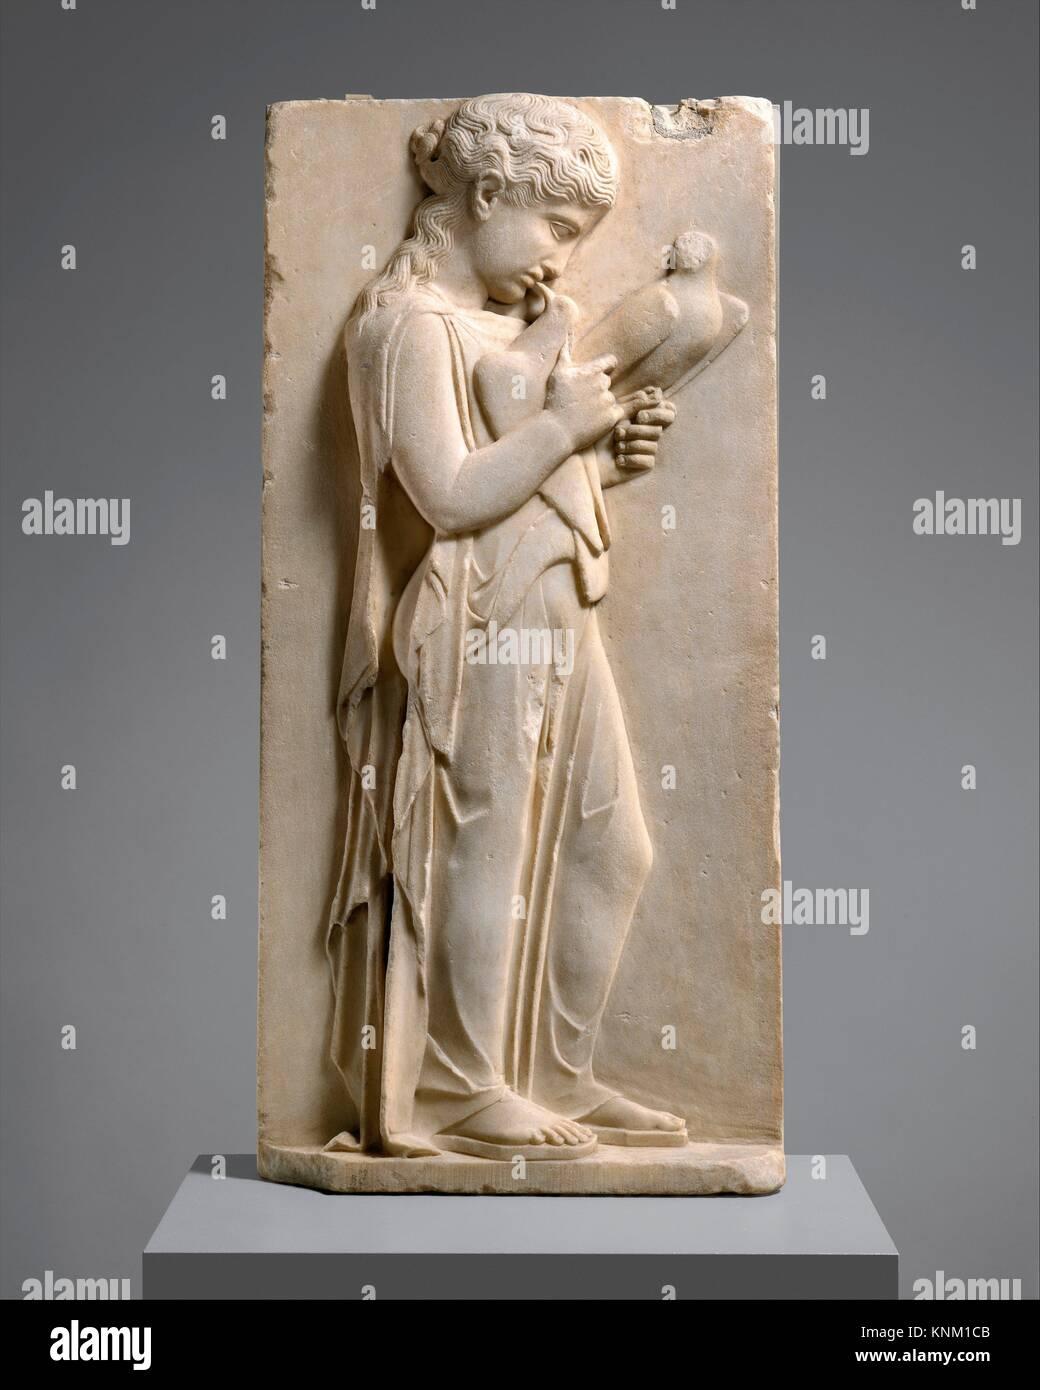 Marble grave stele of a little girl. Period: Classical; Date: ca. 450-440 B.C; Culture: Greek; Medium: Marble, Parian; - Stock Image